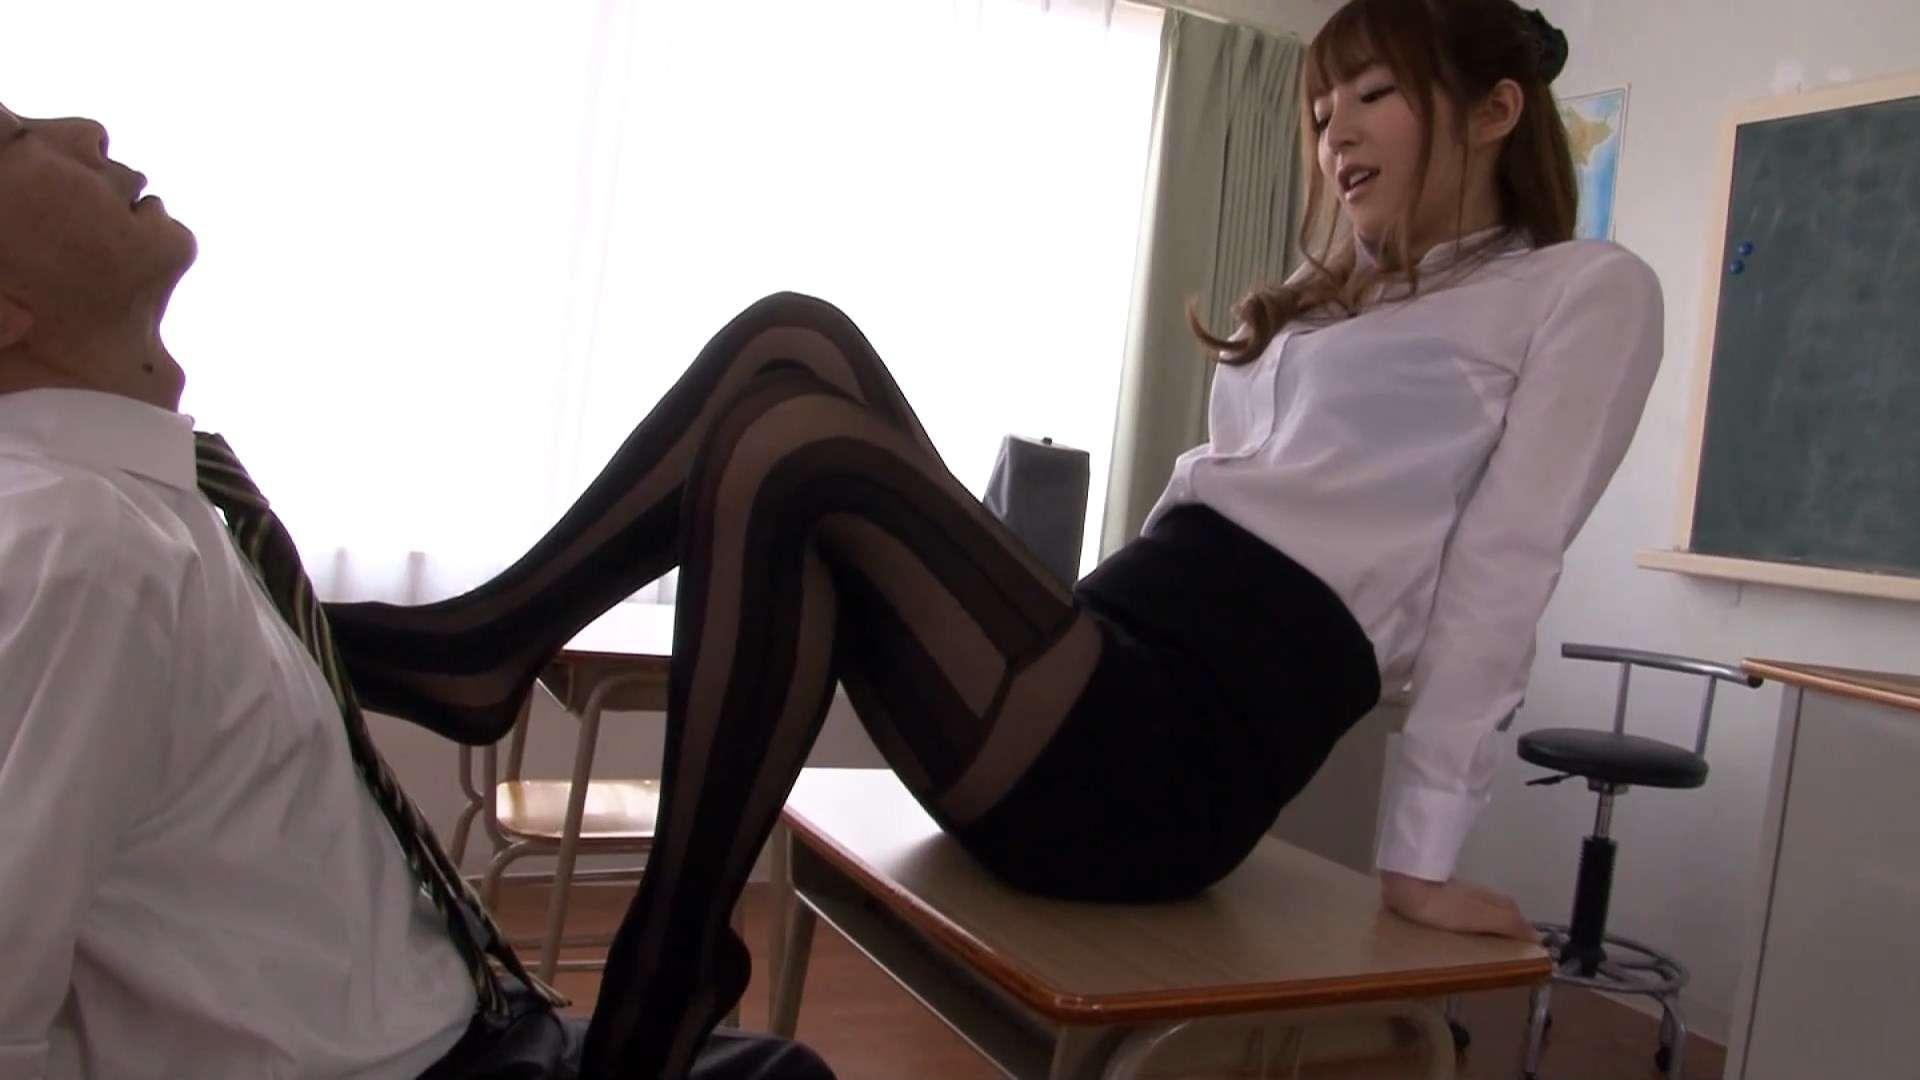 MIDE-020 大桥未久紧身超短裙女教师